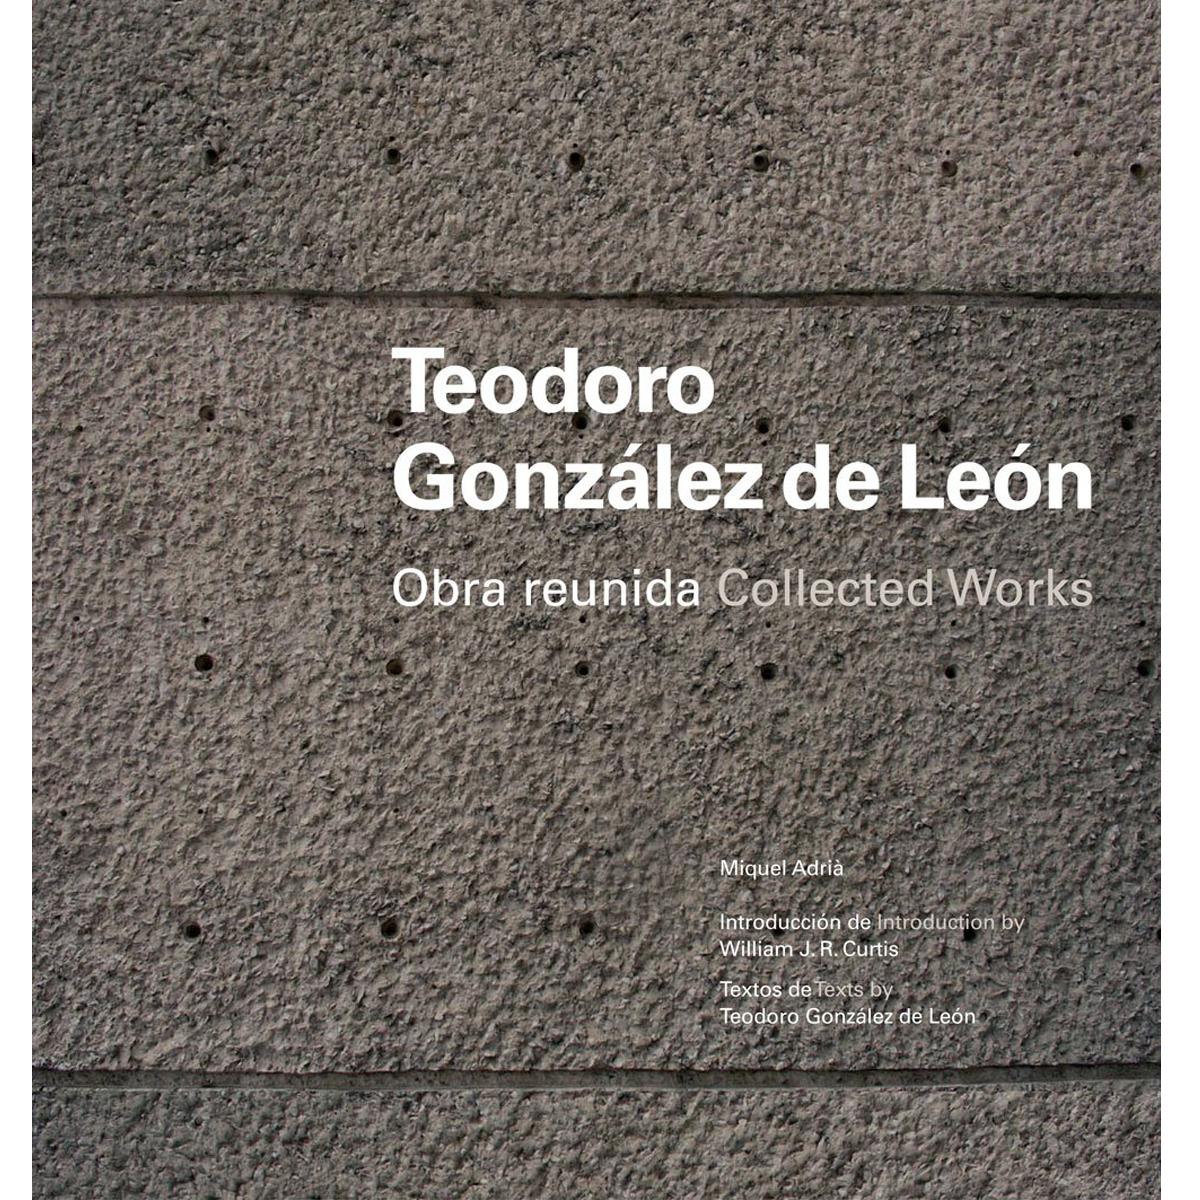 Teodoro González de León